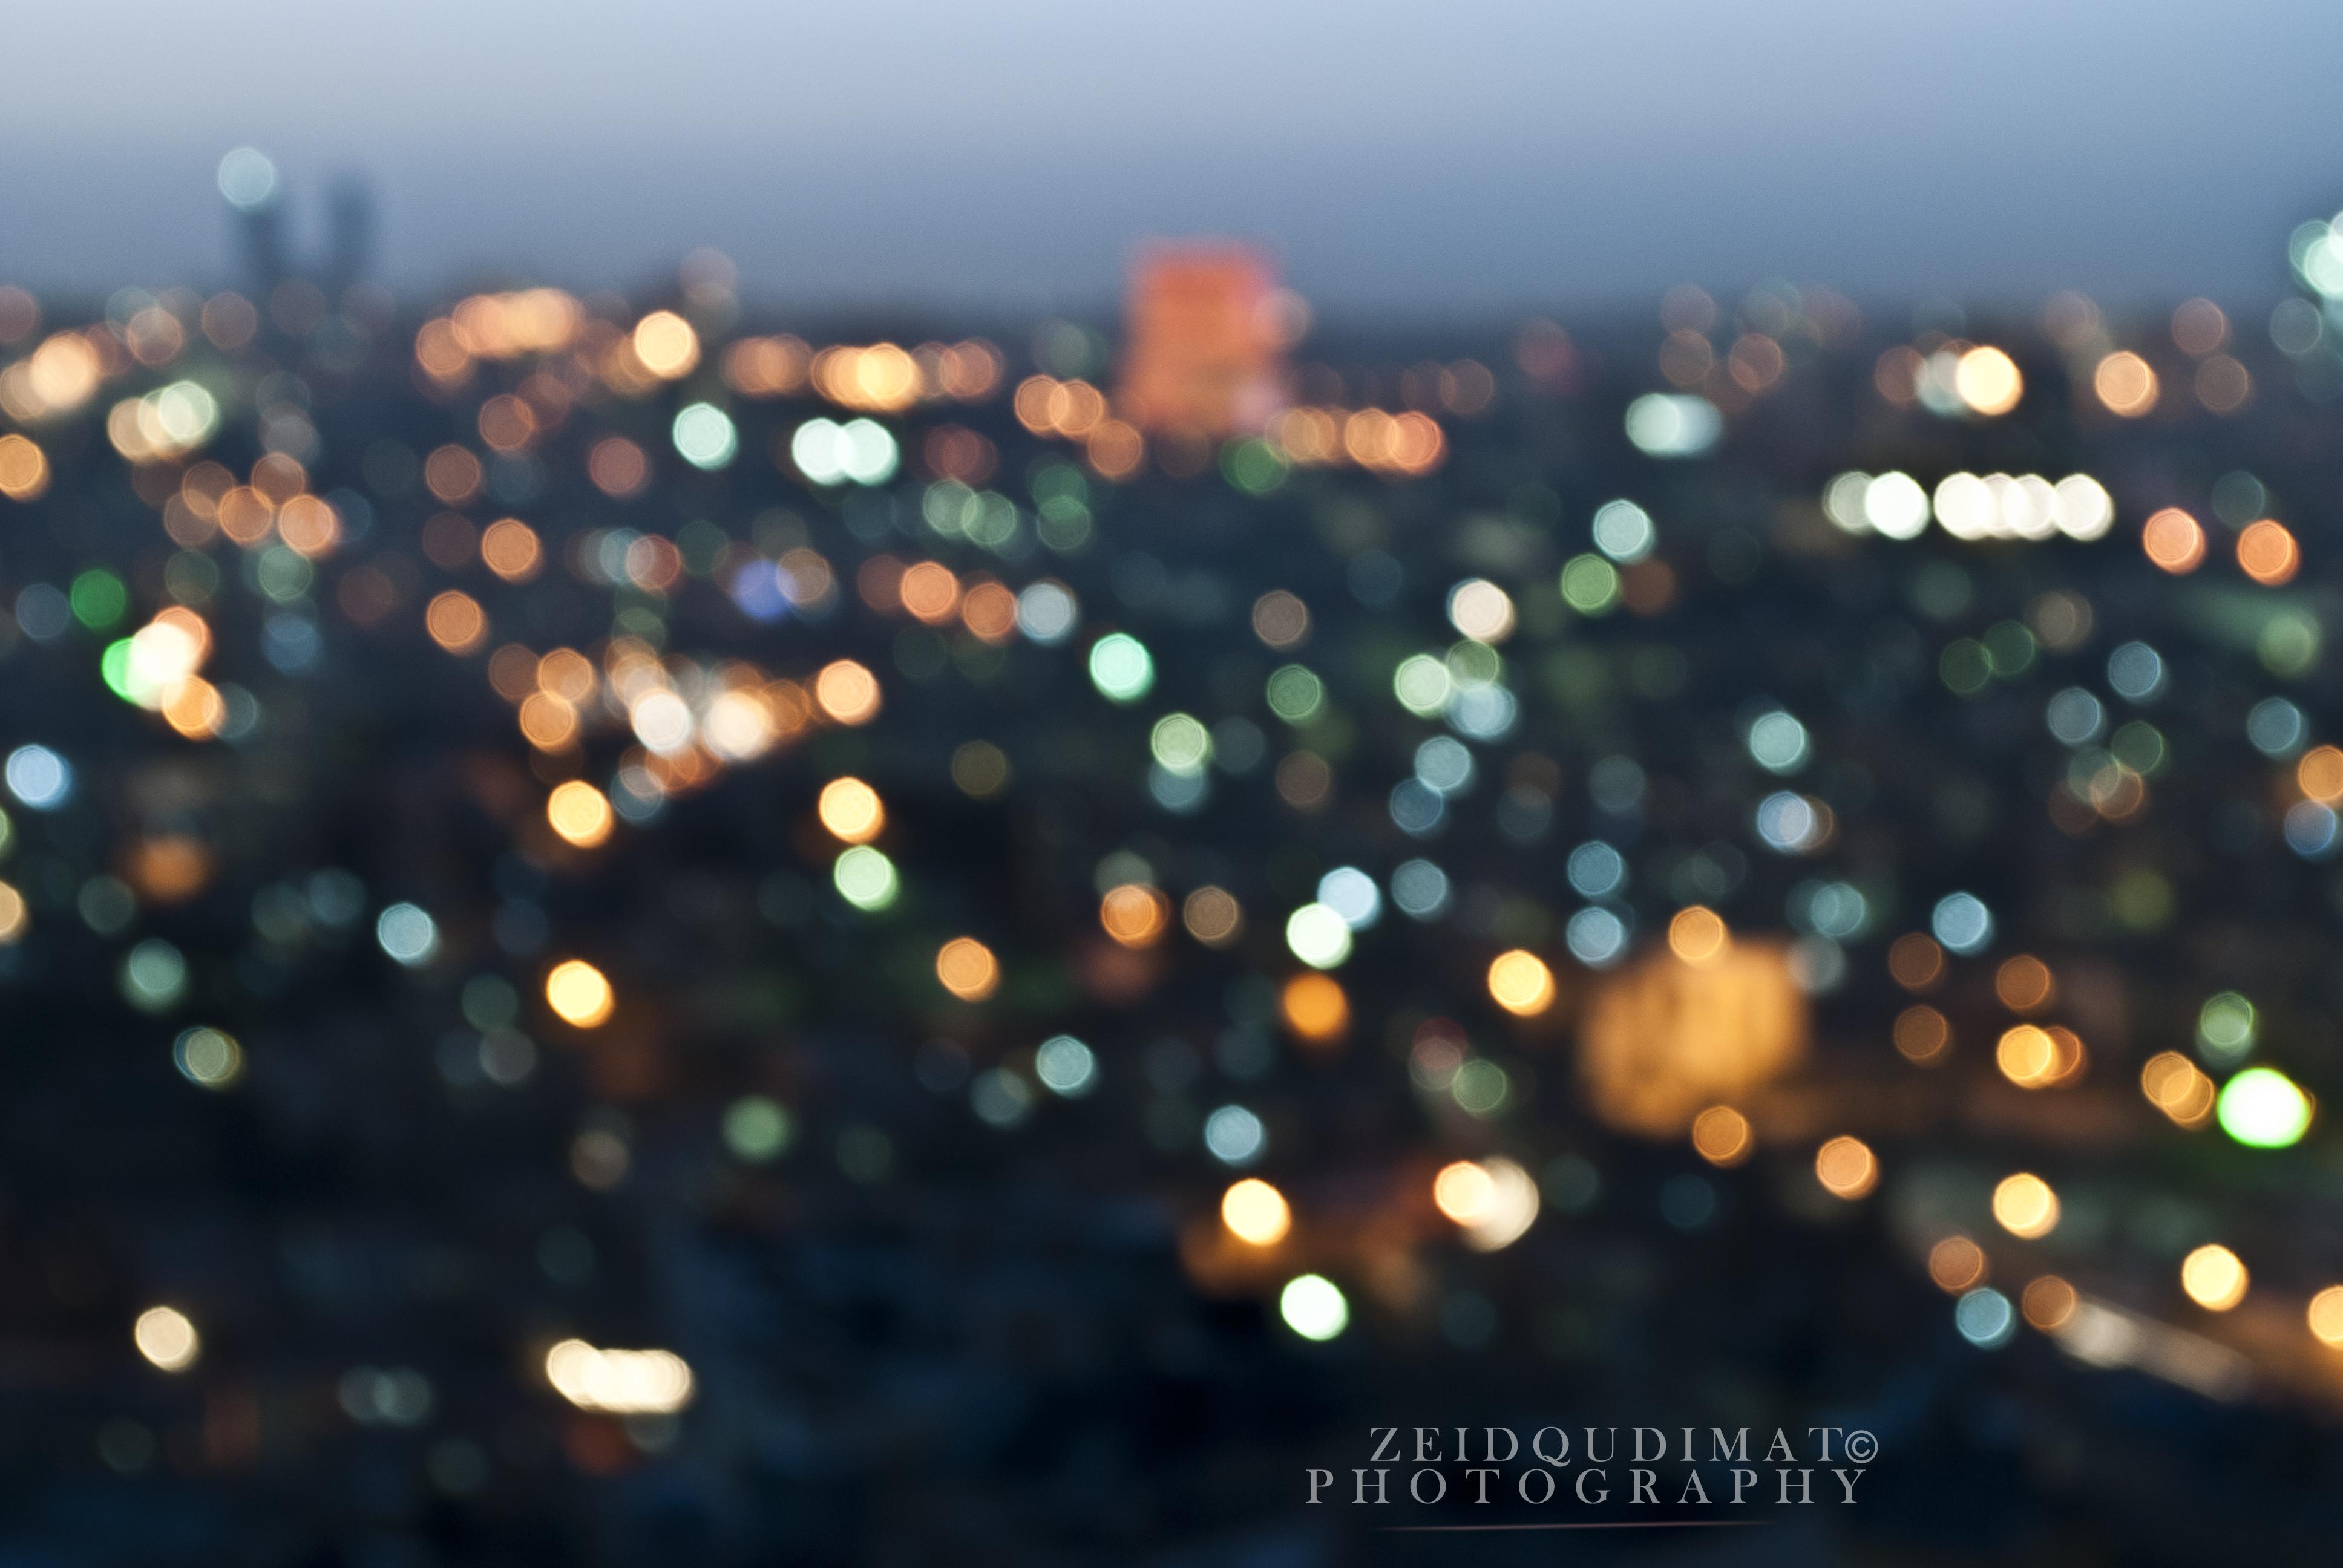 Amman Bokeh Effect by zeidroid on DeviantArt